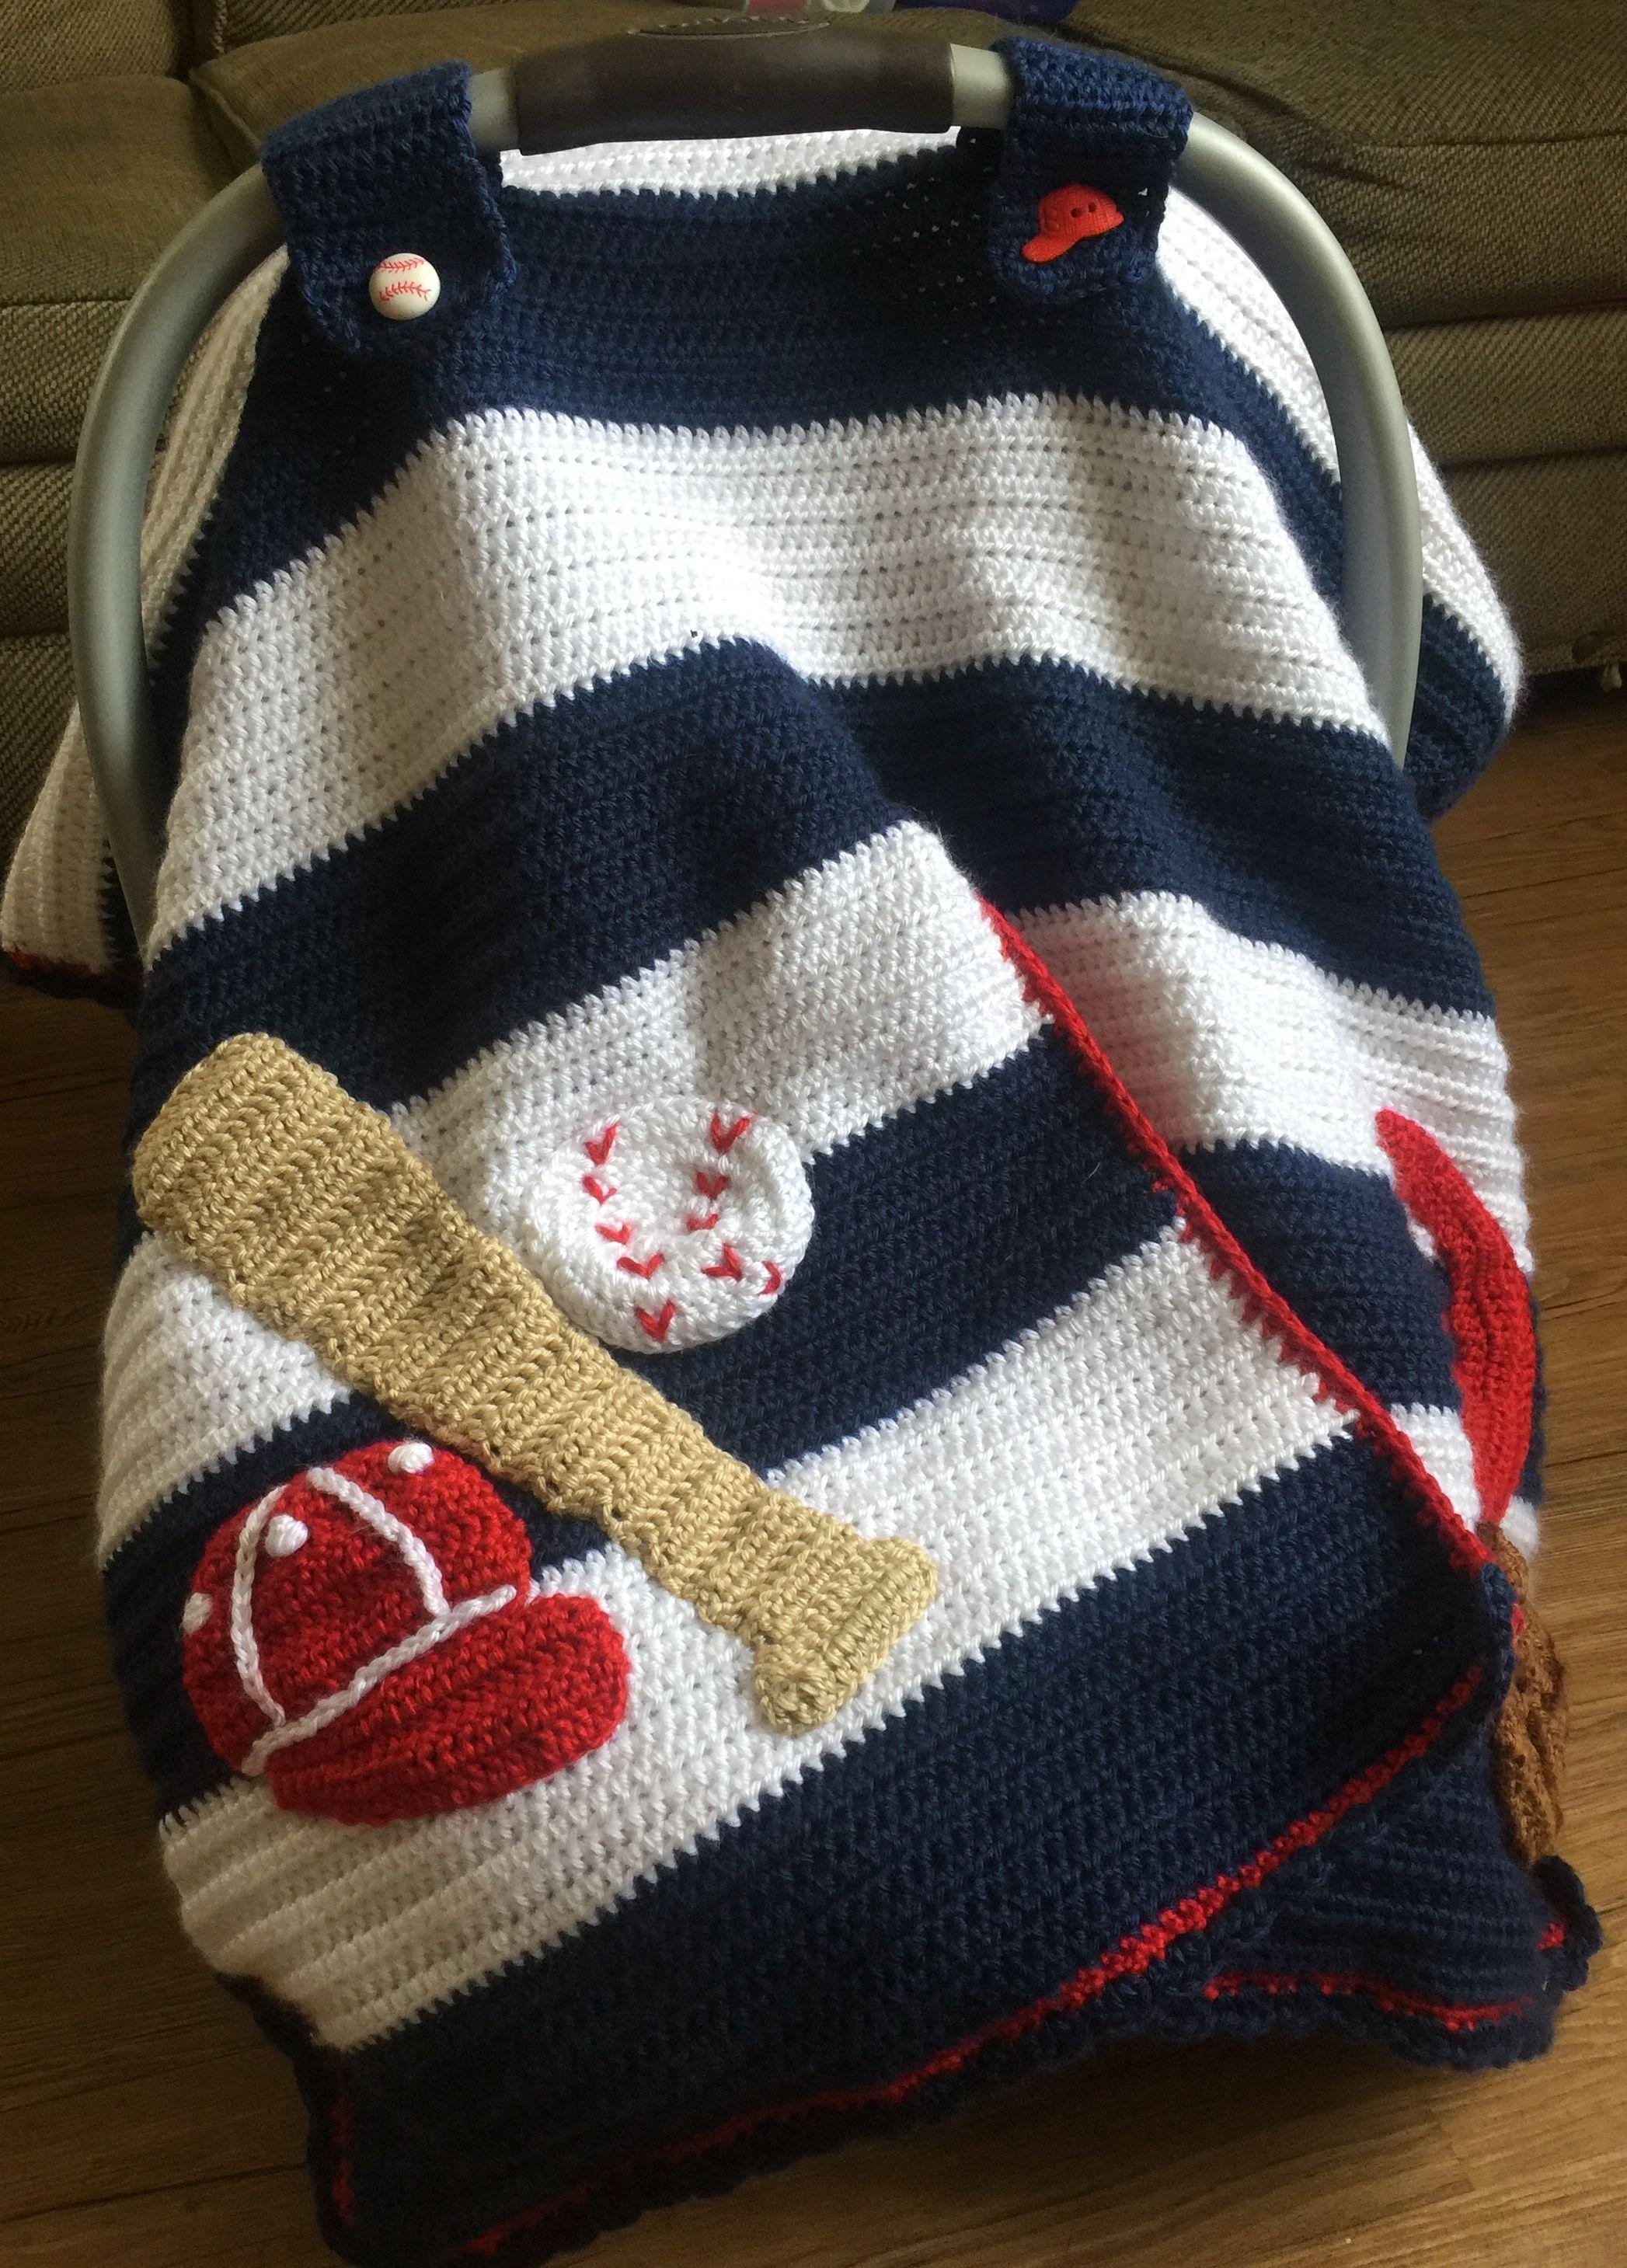 Basic & Standard Patterns for Boy Blanket Crochet Child Poncho Car Seat Cape Crochet Boy Blanket Patterns Free Cover